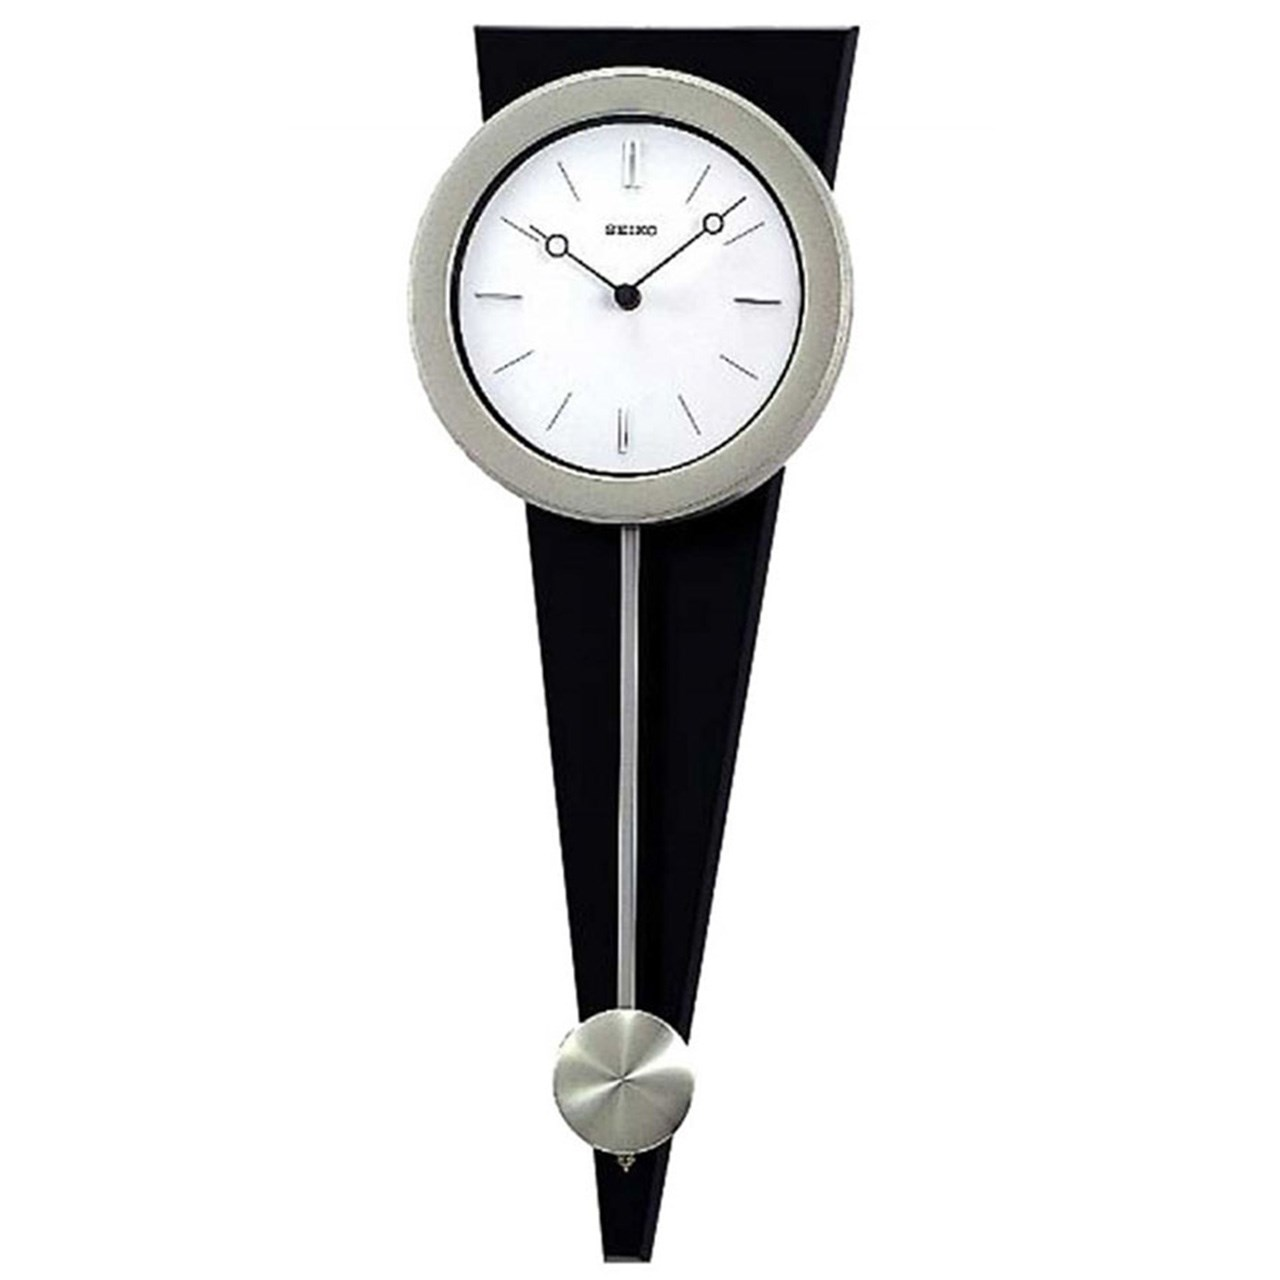 ساعت دیواری سیکو مدل QXC111SL